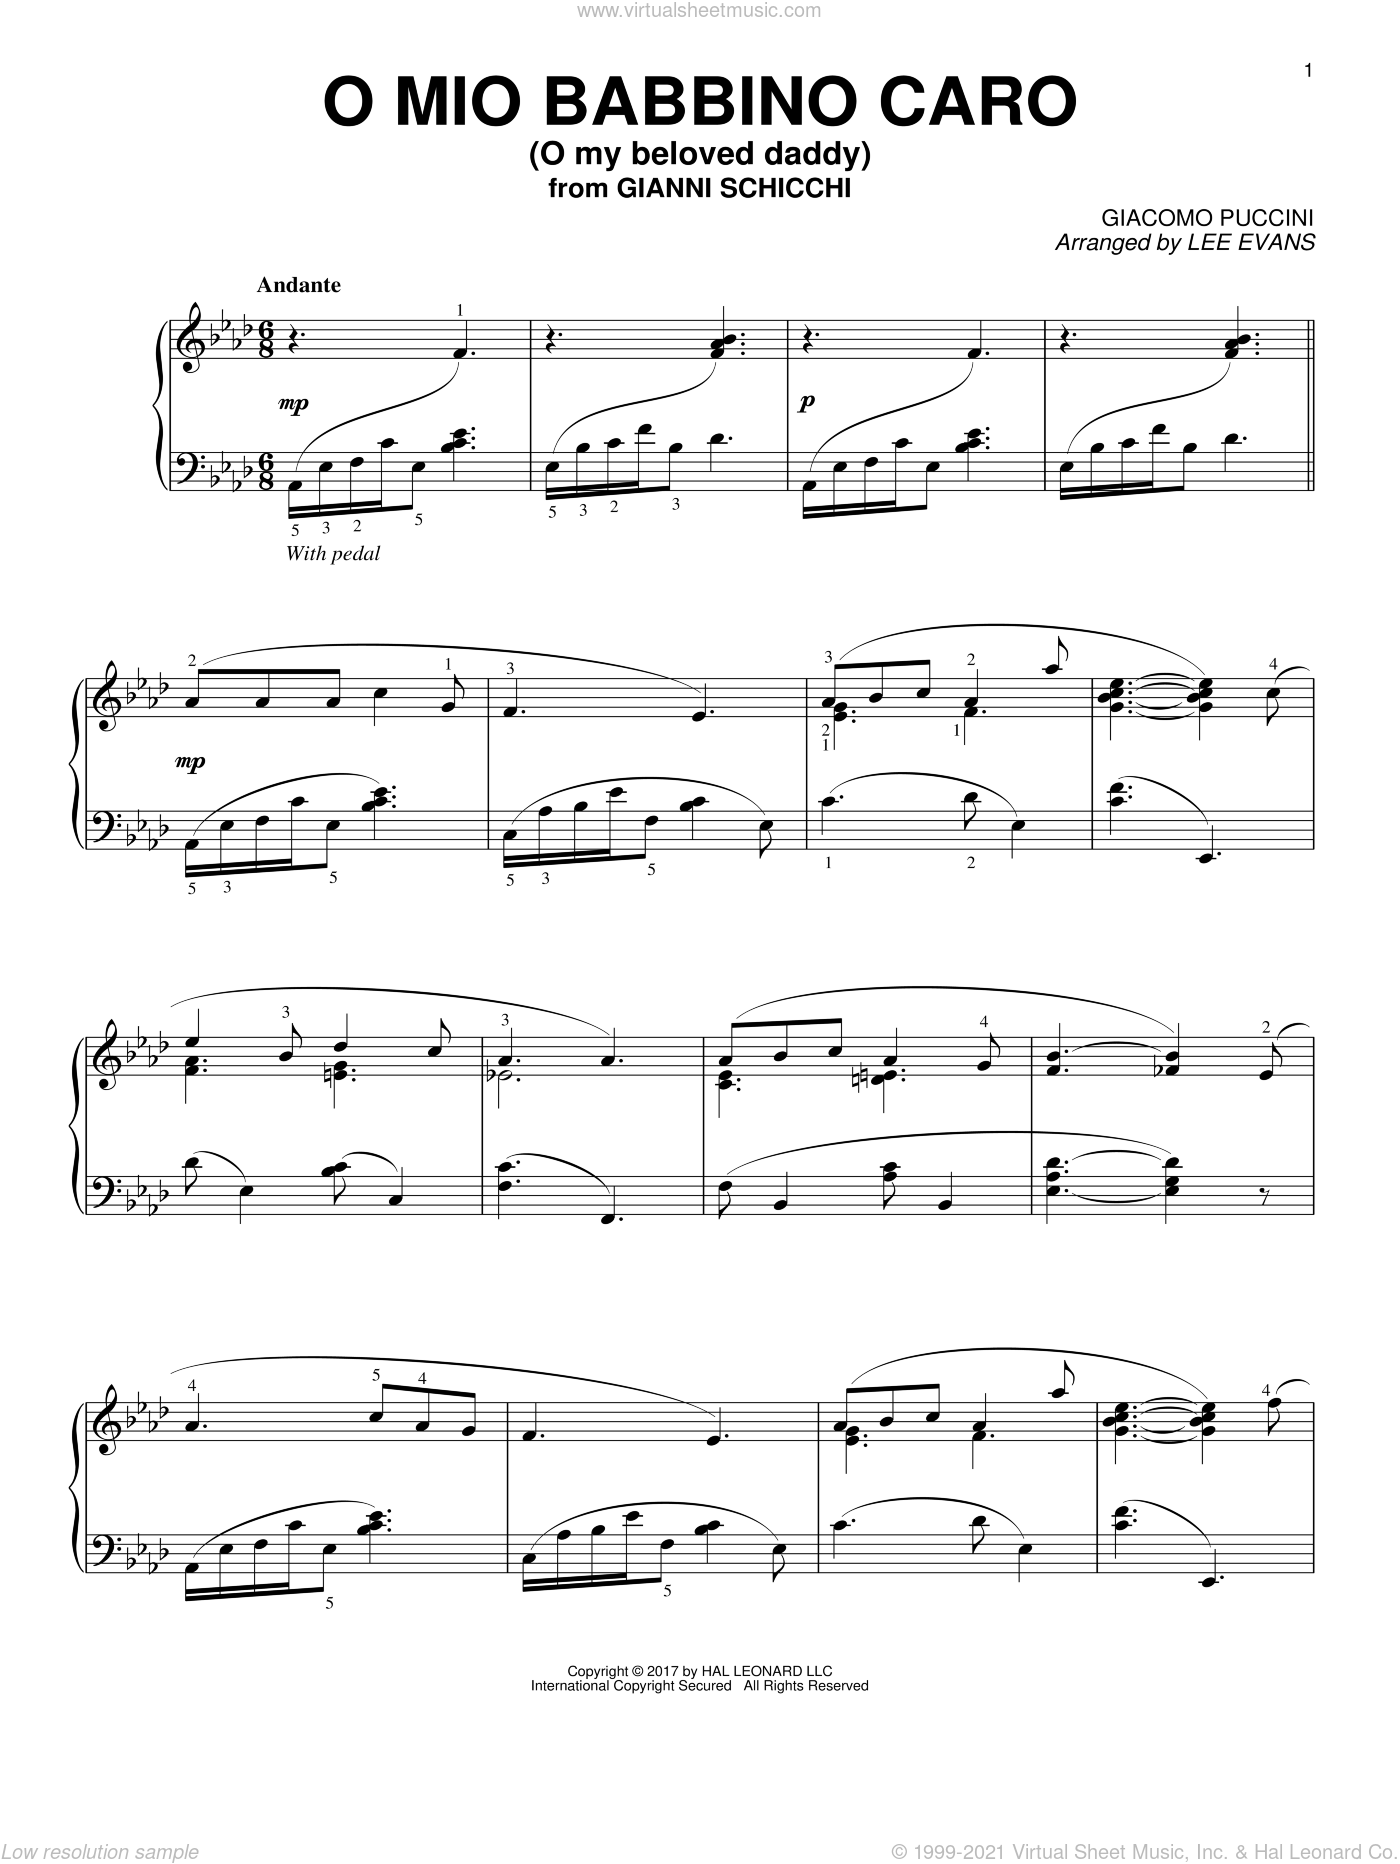 O Mio Babbino Caro sheet music for piano solo by Giacomo Puccini and Lee Evans, classical score, intermediate skill level